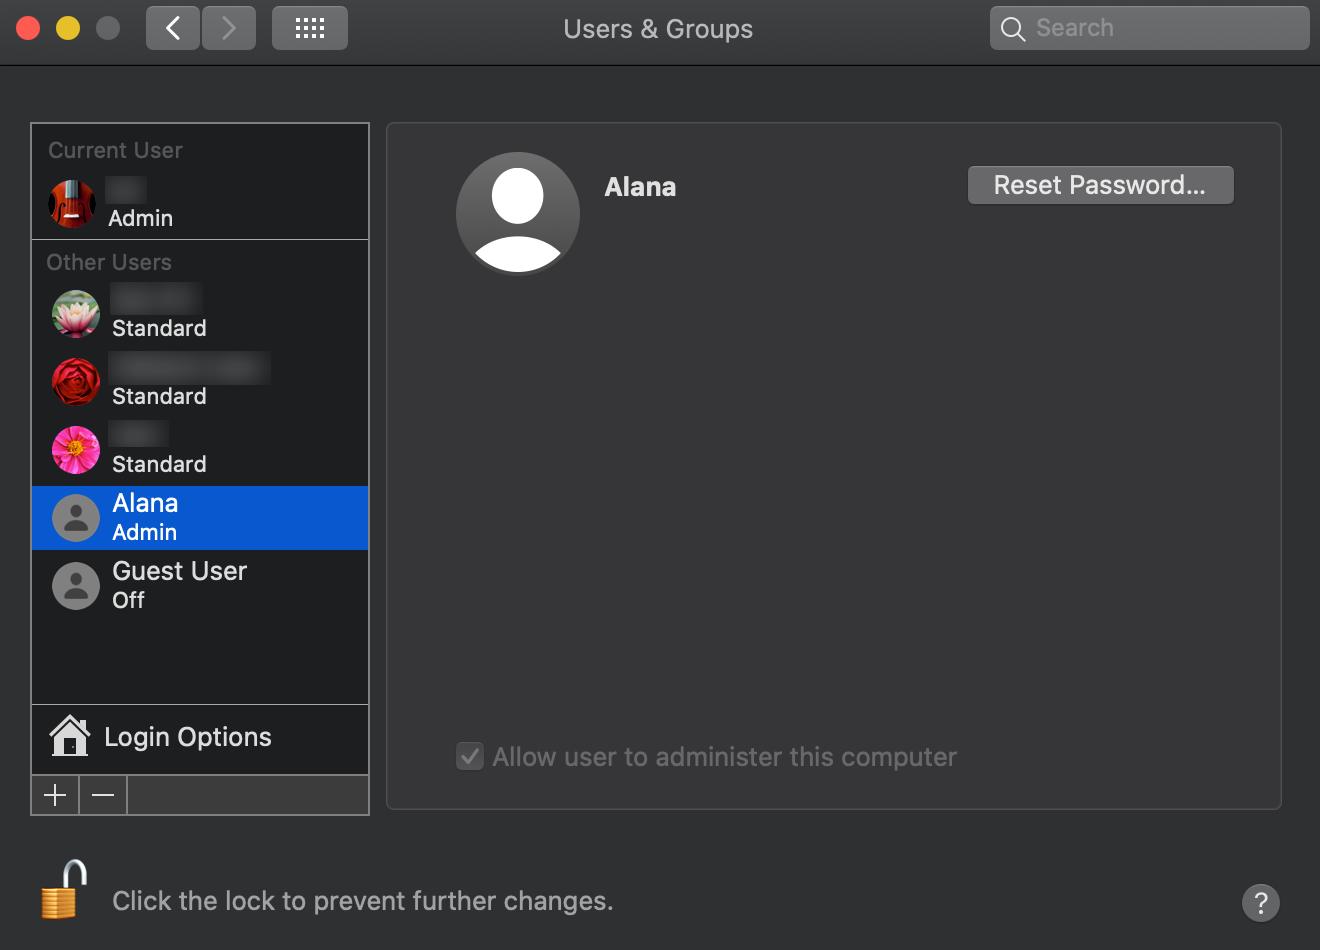 Execute or run custom scripts on mac using mdm